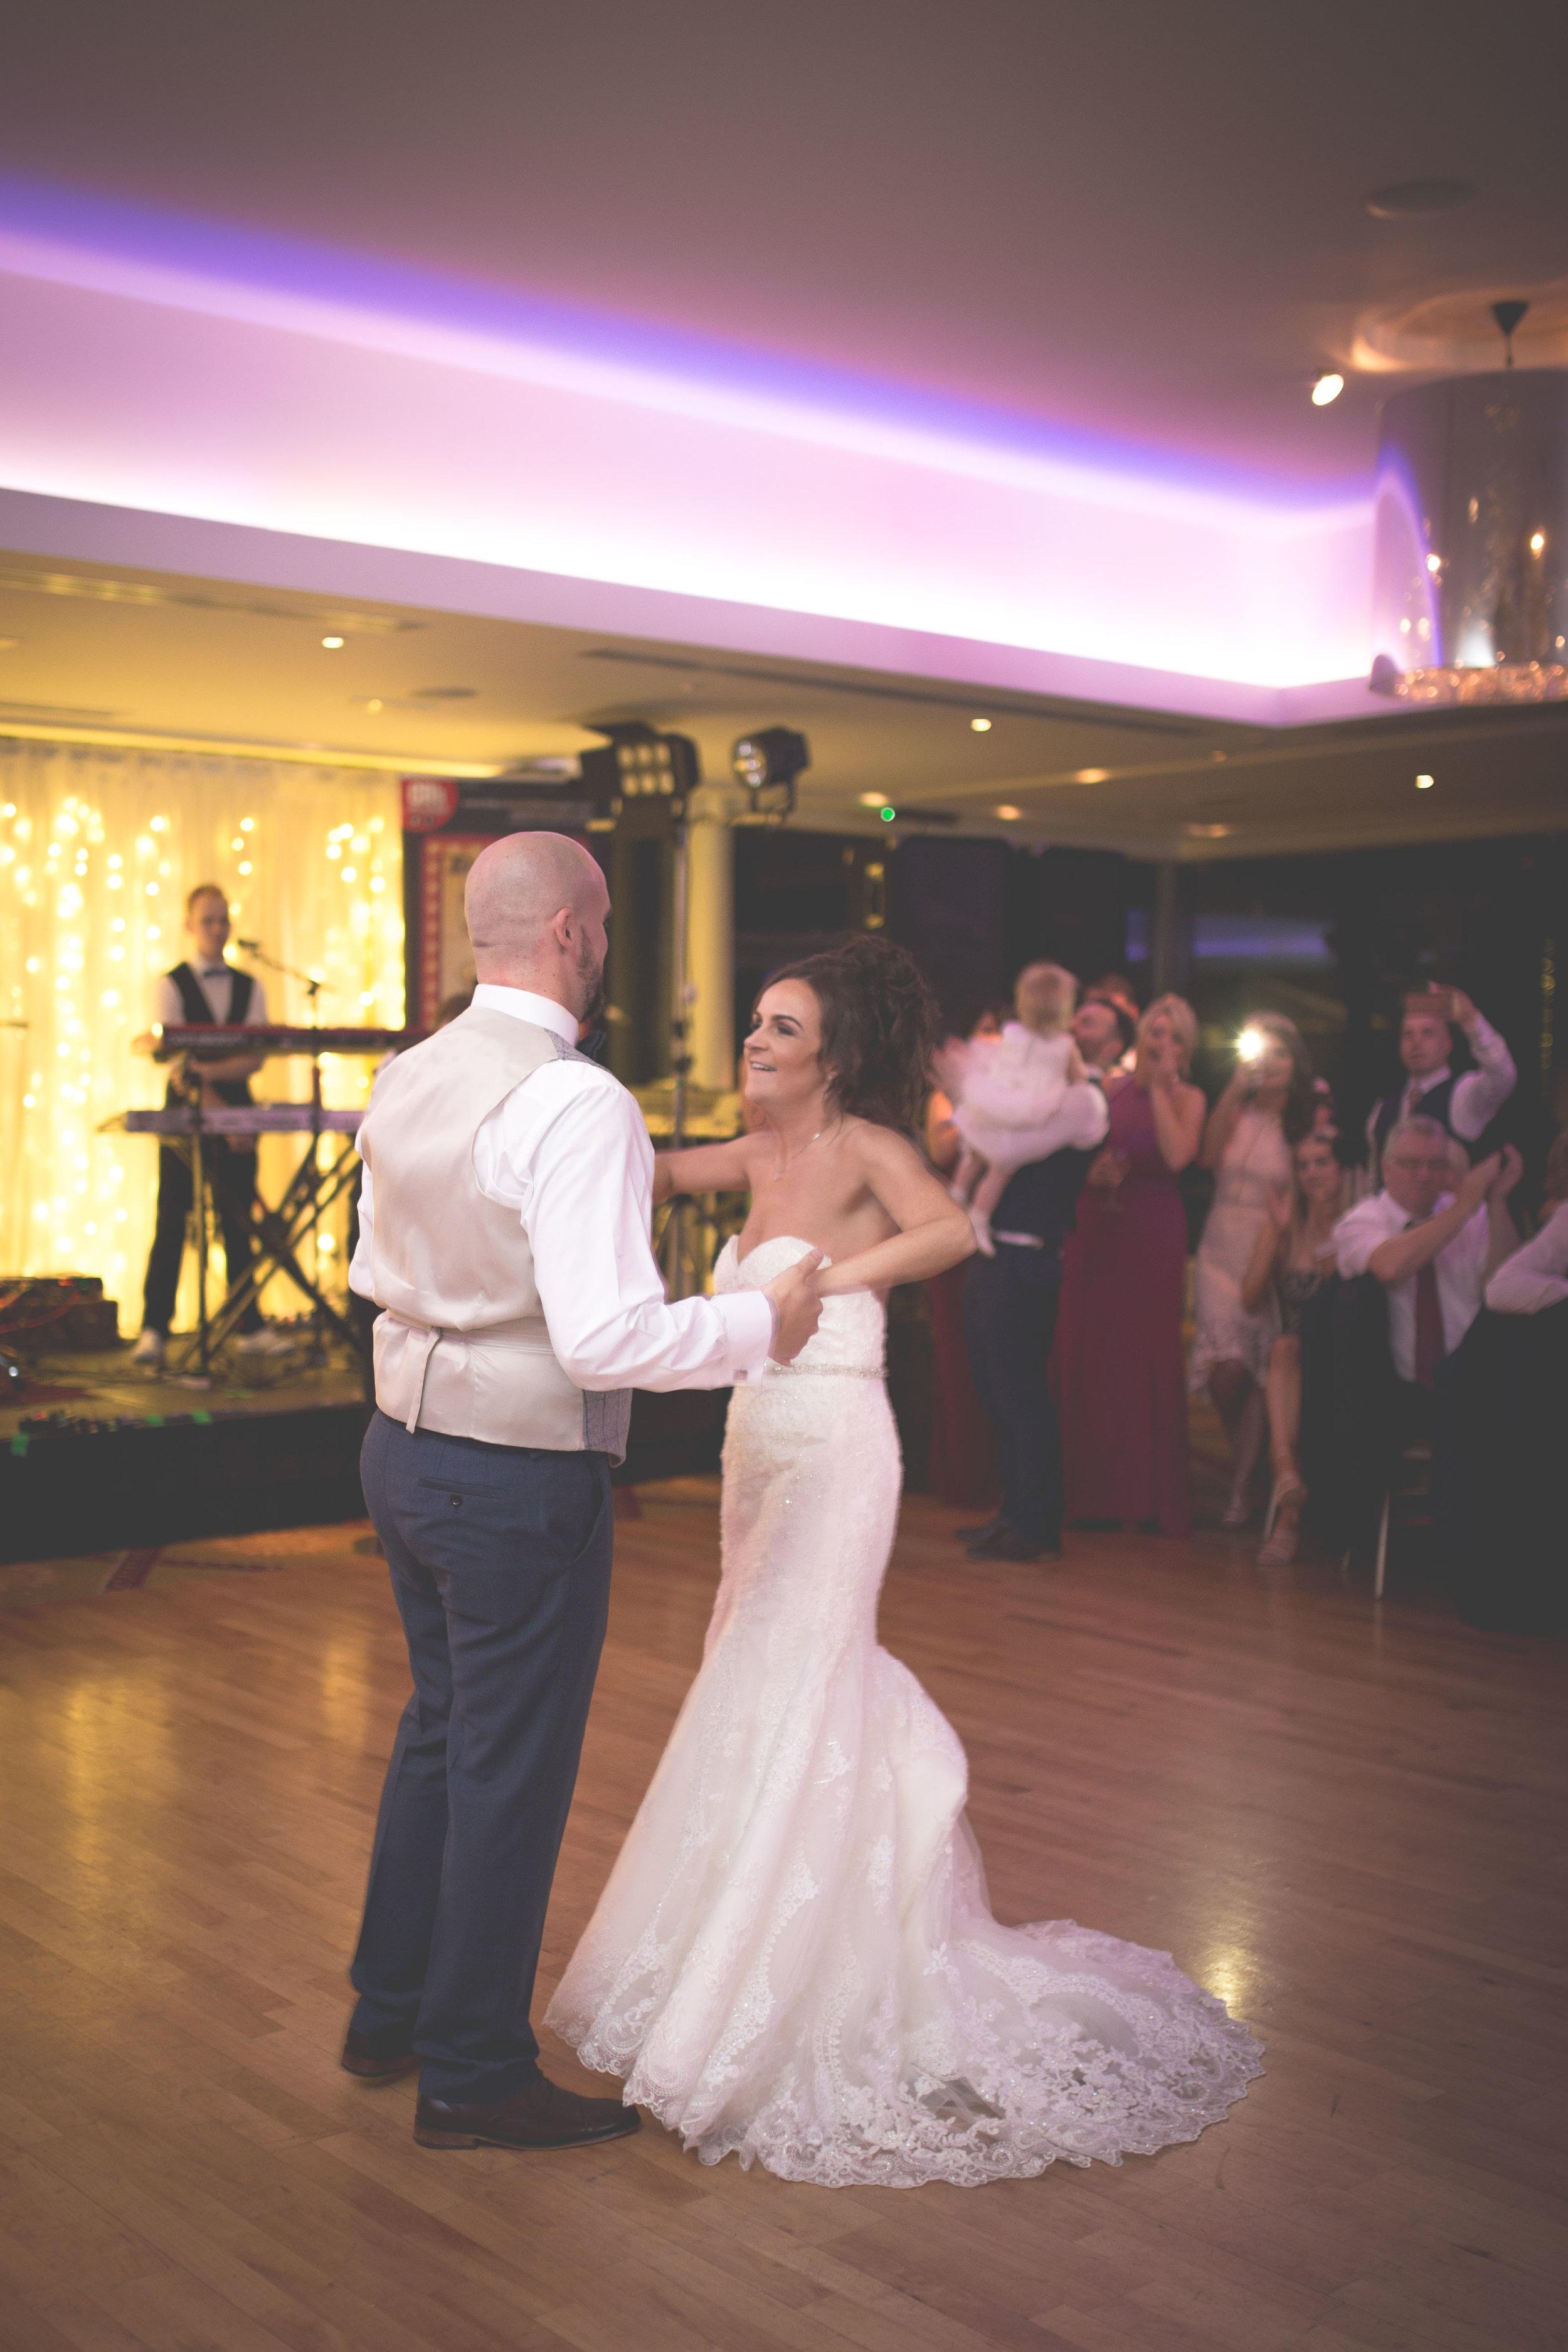 Aisling & Andy - First Dance-27.jpg